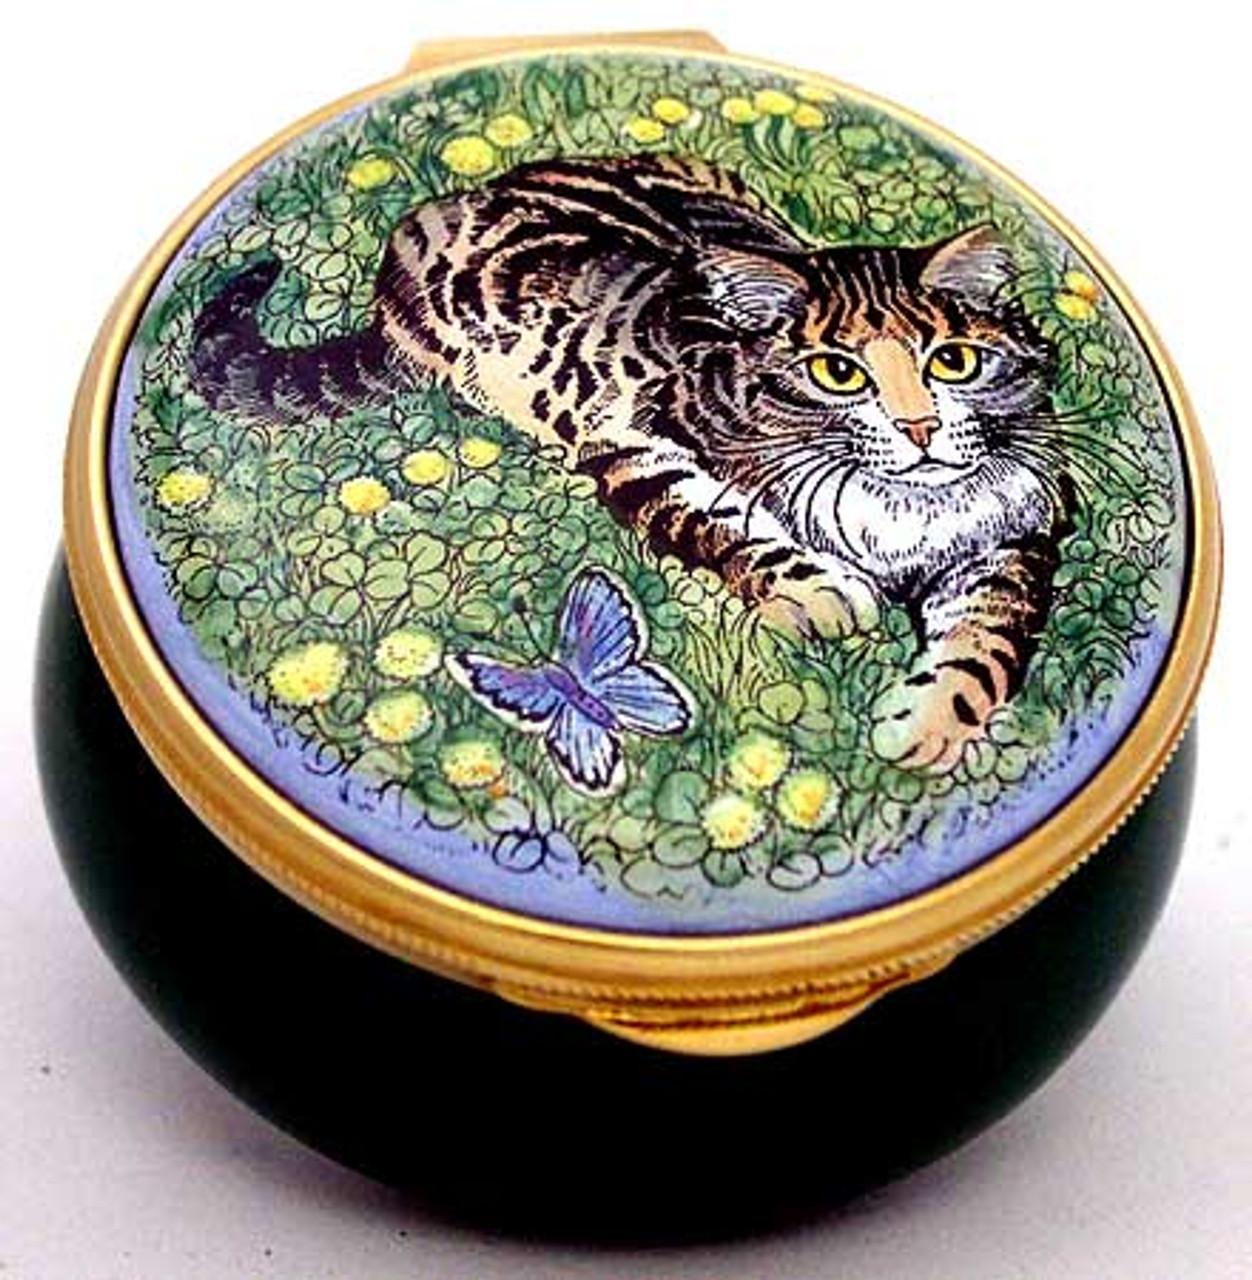 Staffordshire Tabby Cat